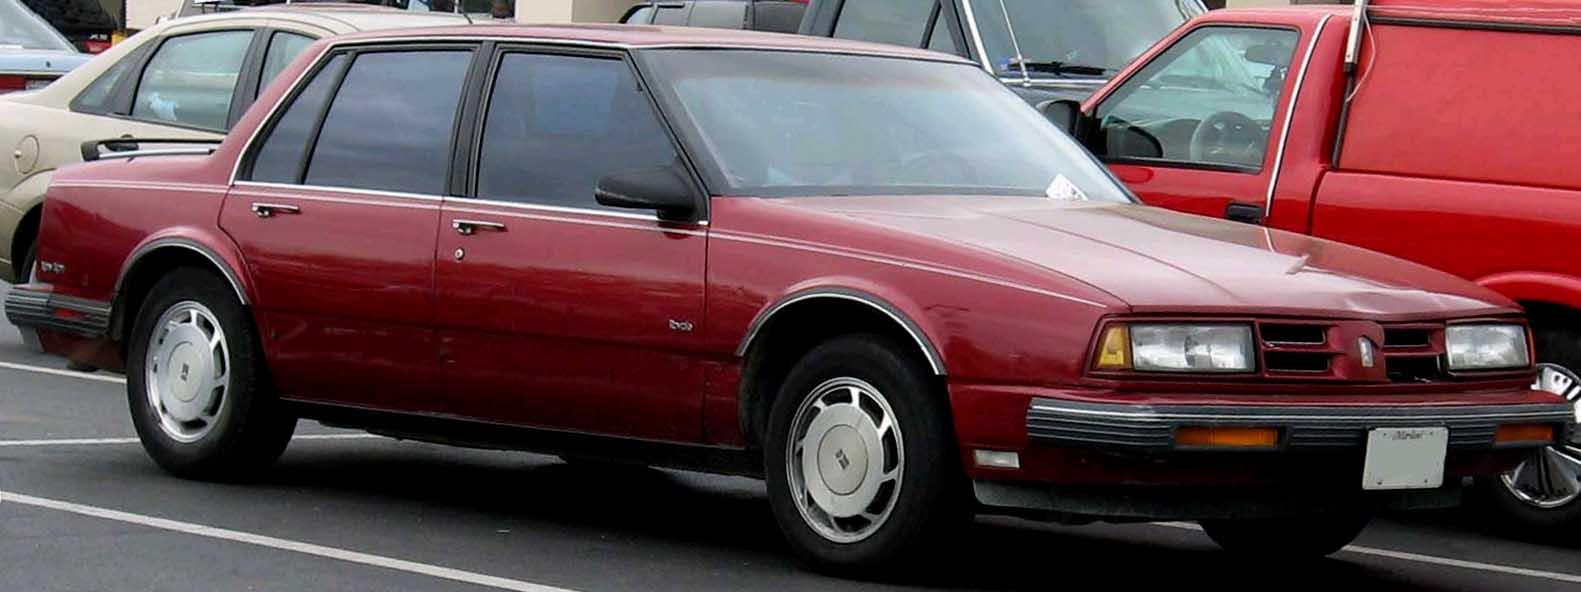 1991 Oldsmobile Delta 88 Royale 1992 Parts